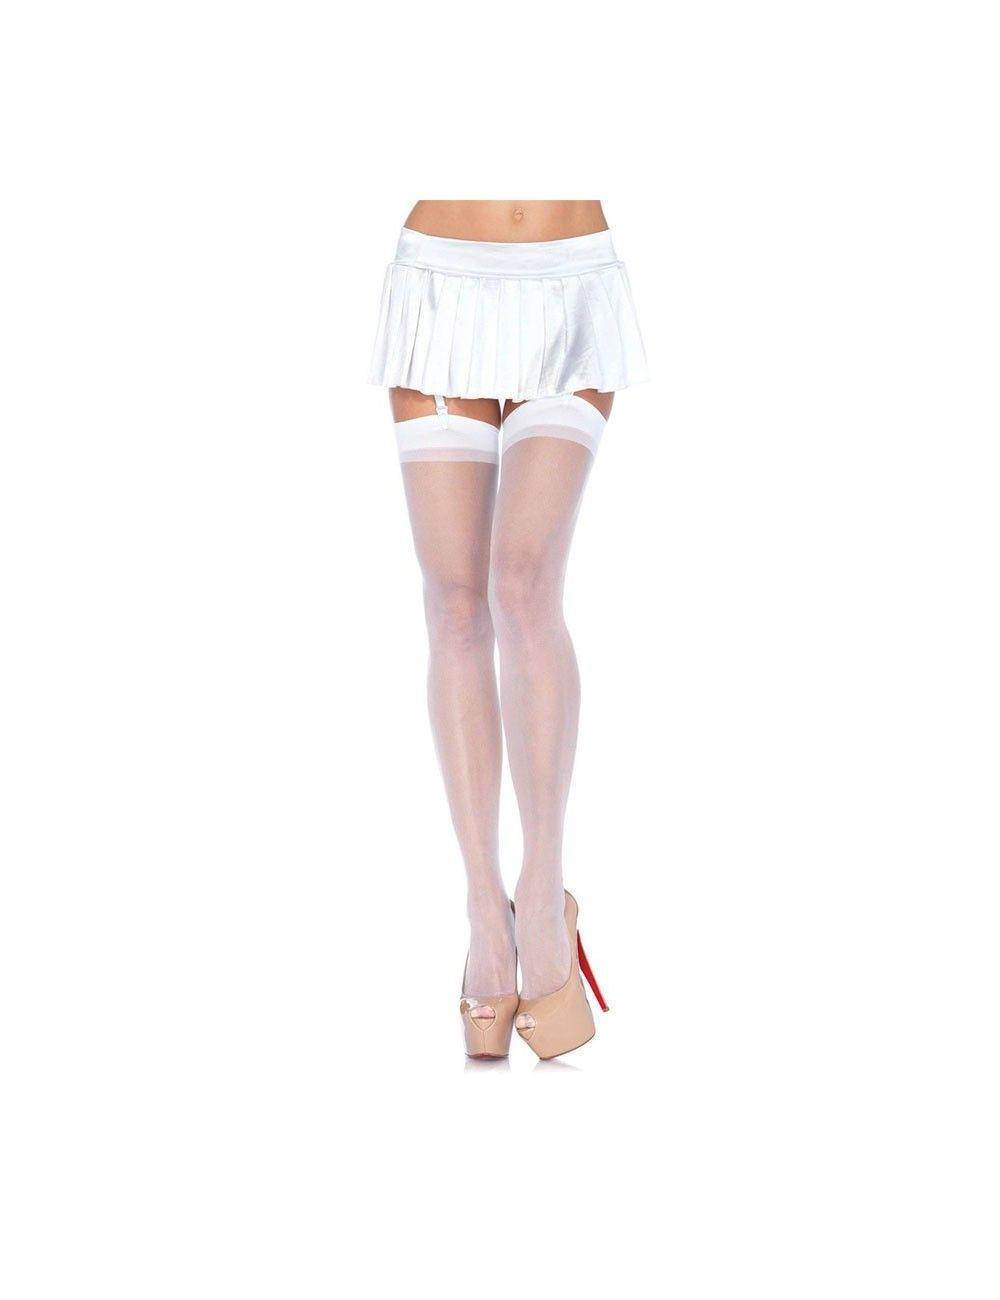 Bas Sexy Blanc & Voile Galbant LEG AVENUE